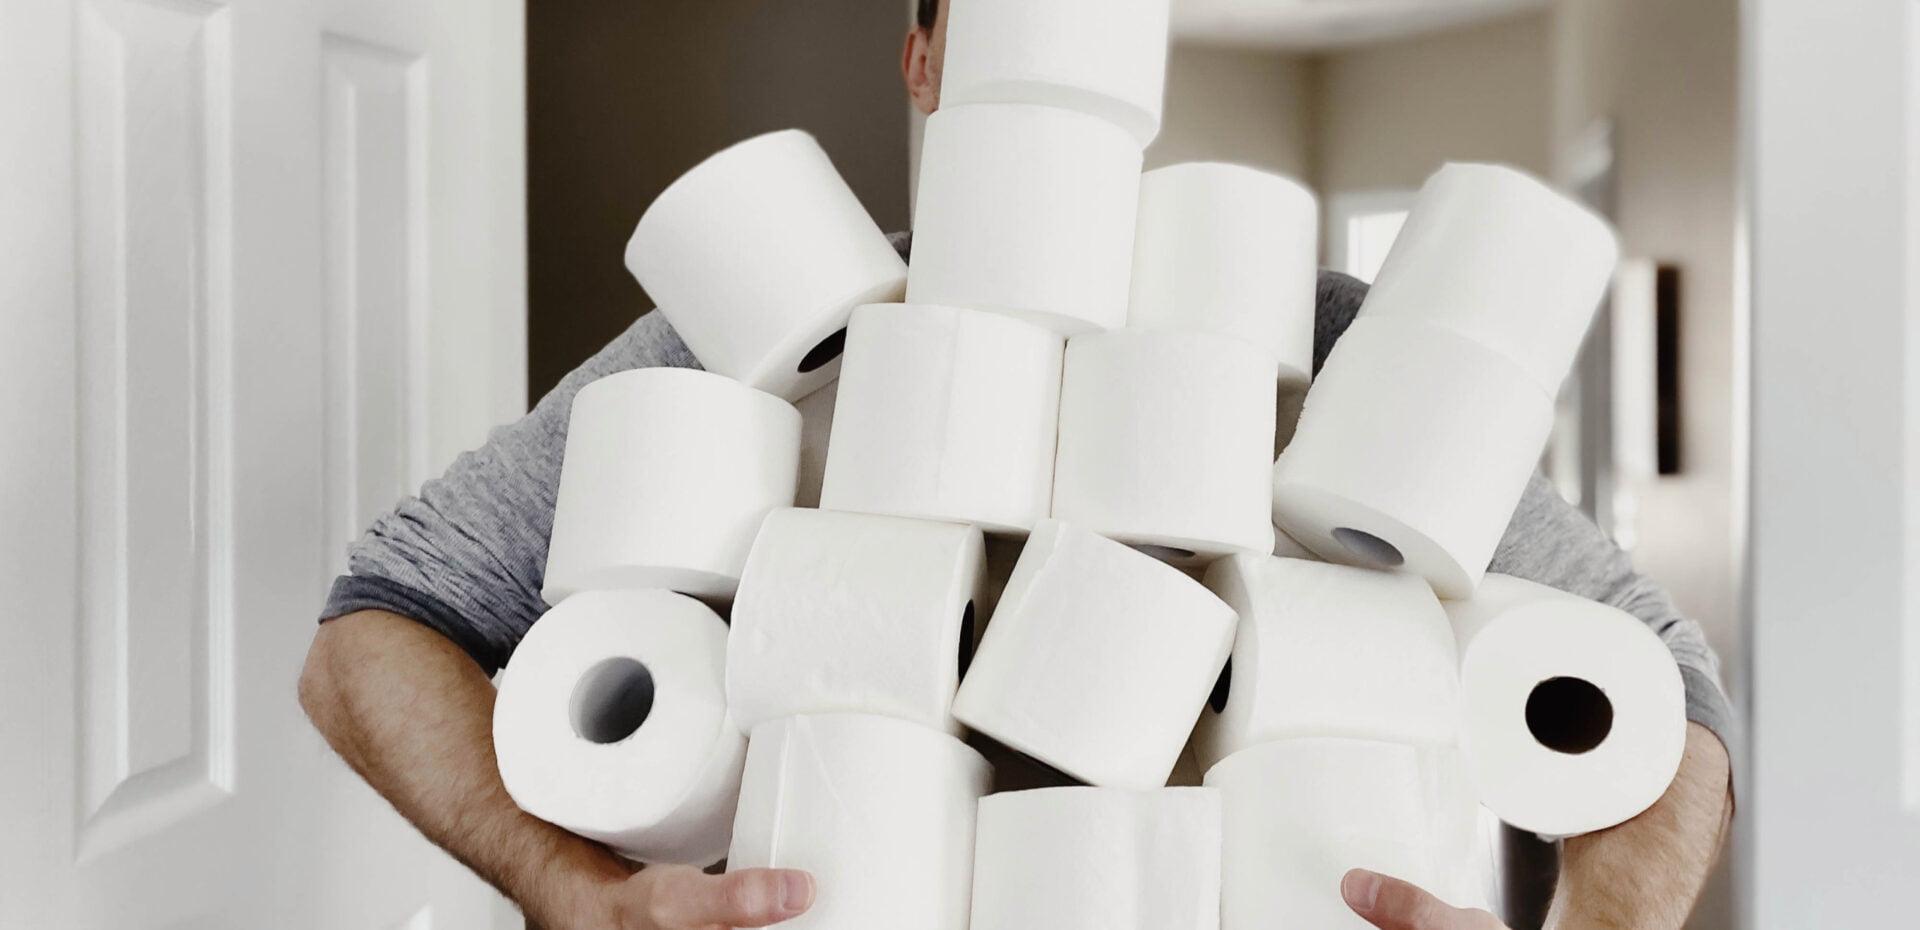 دستمال توالت